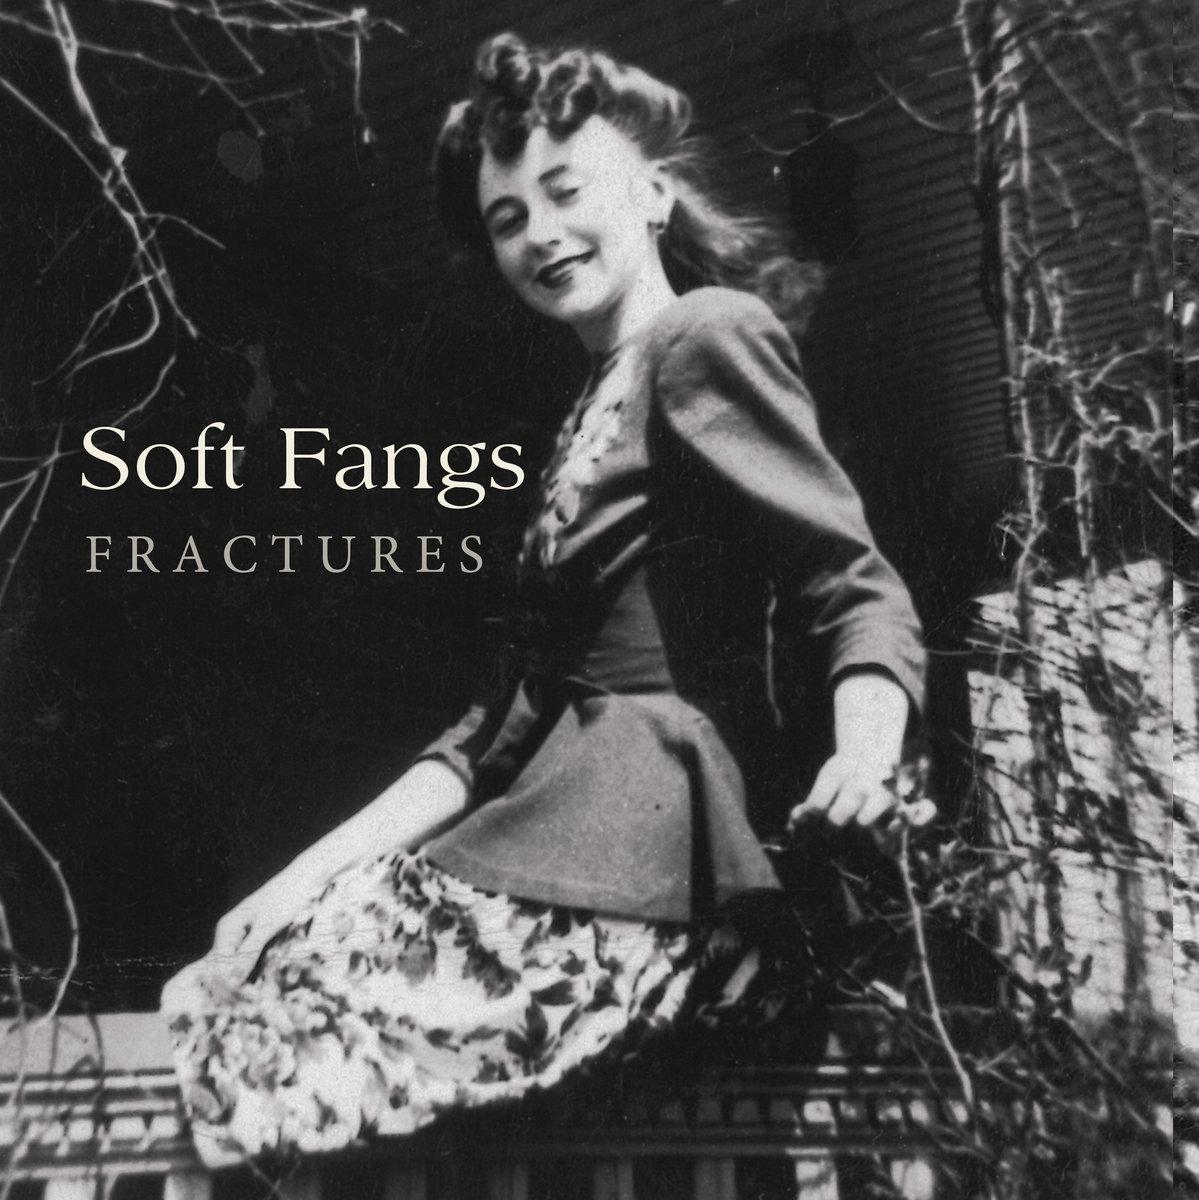 soft fangs fractures artwork